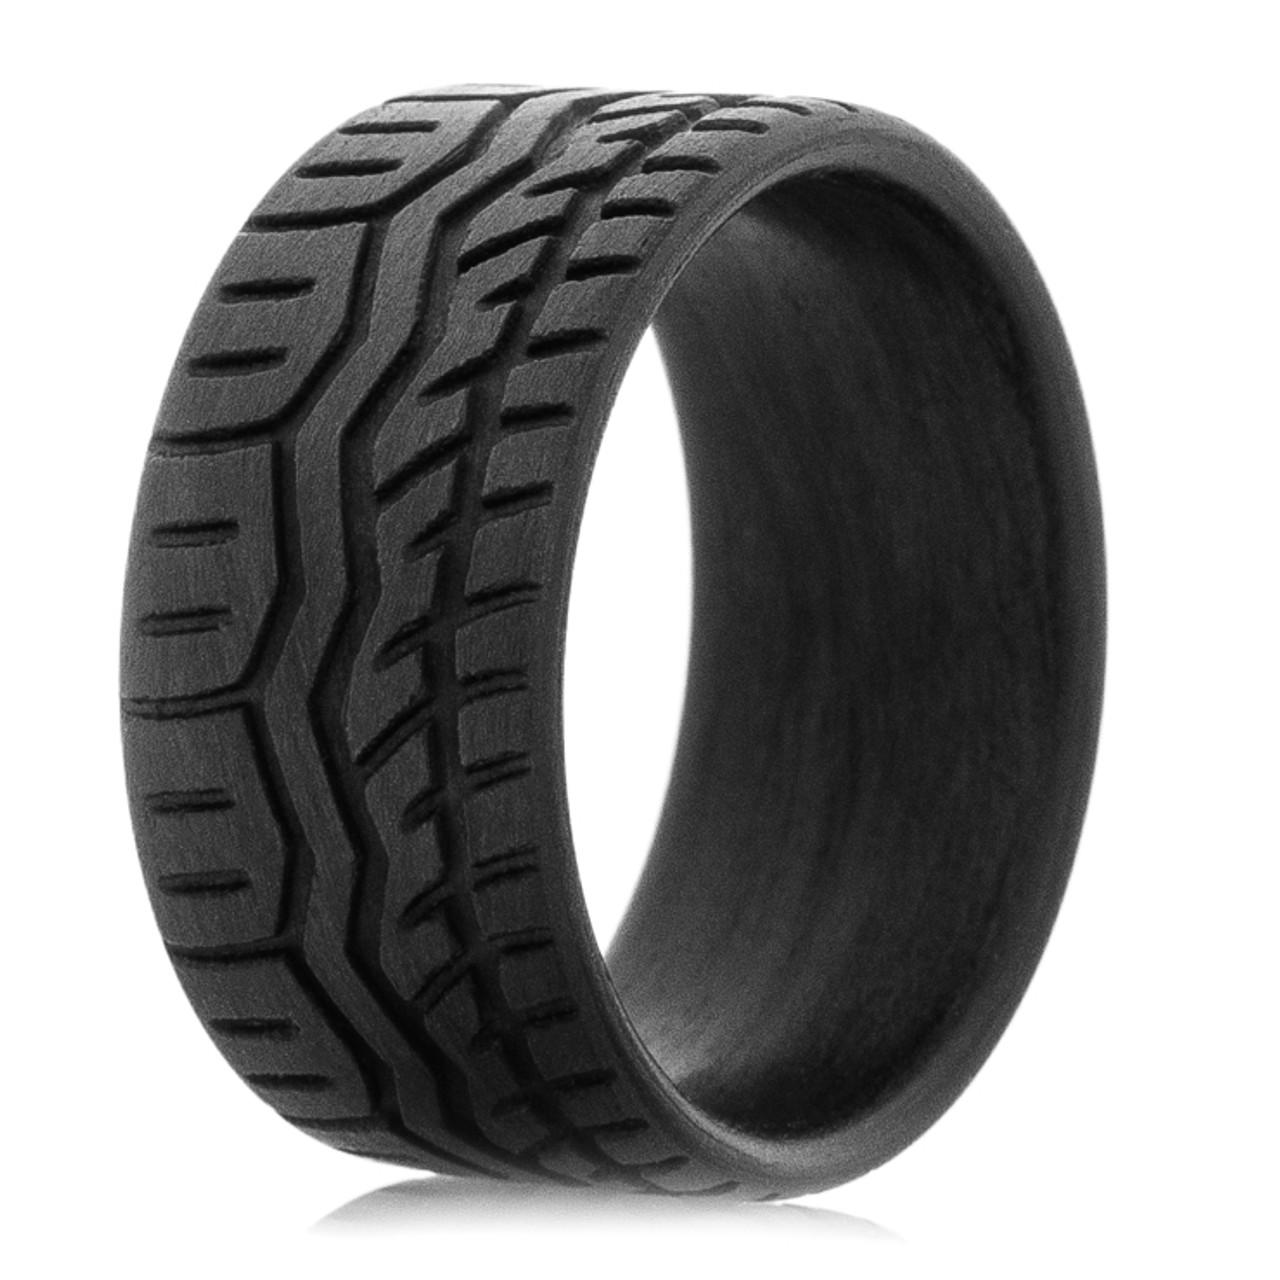 Tire Wedding Rings >> Carbon Fiber Drift Tire Wedding Band Titanium Buzz